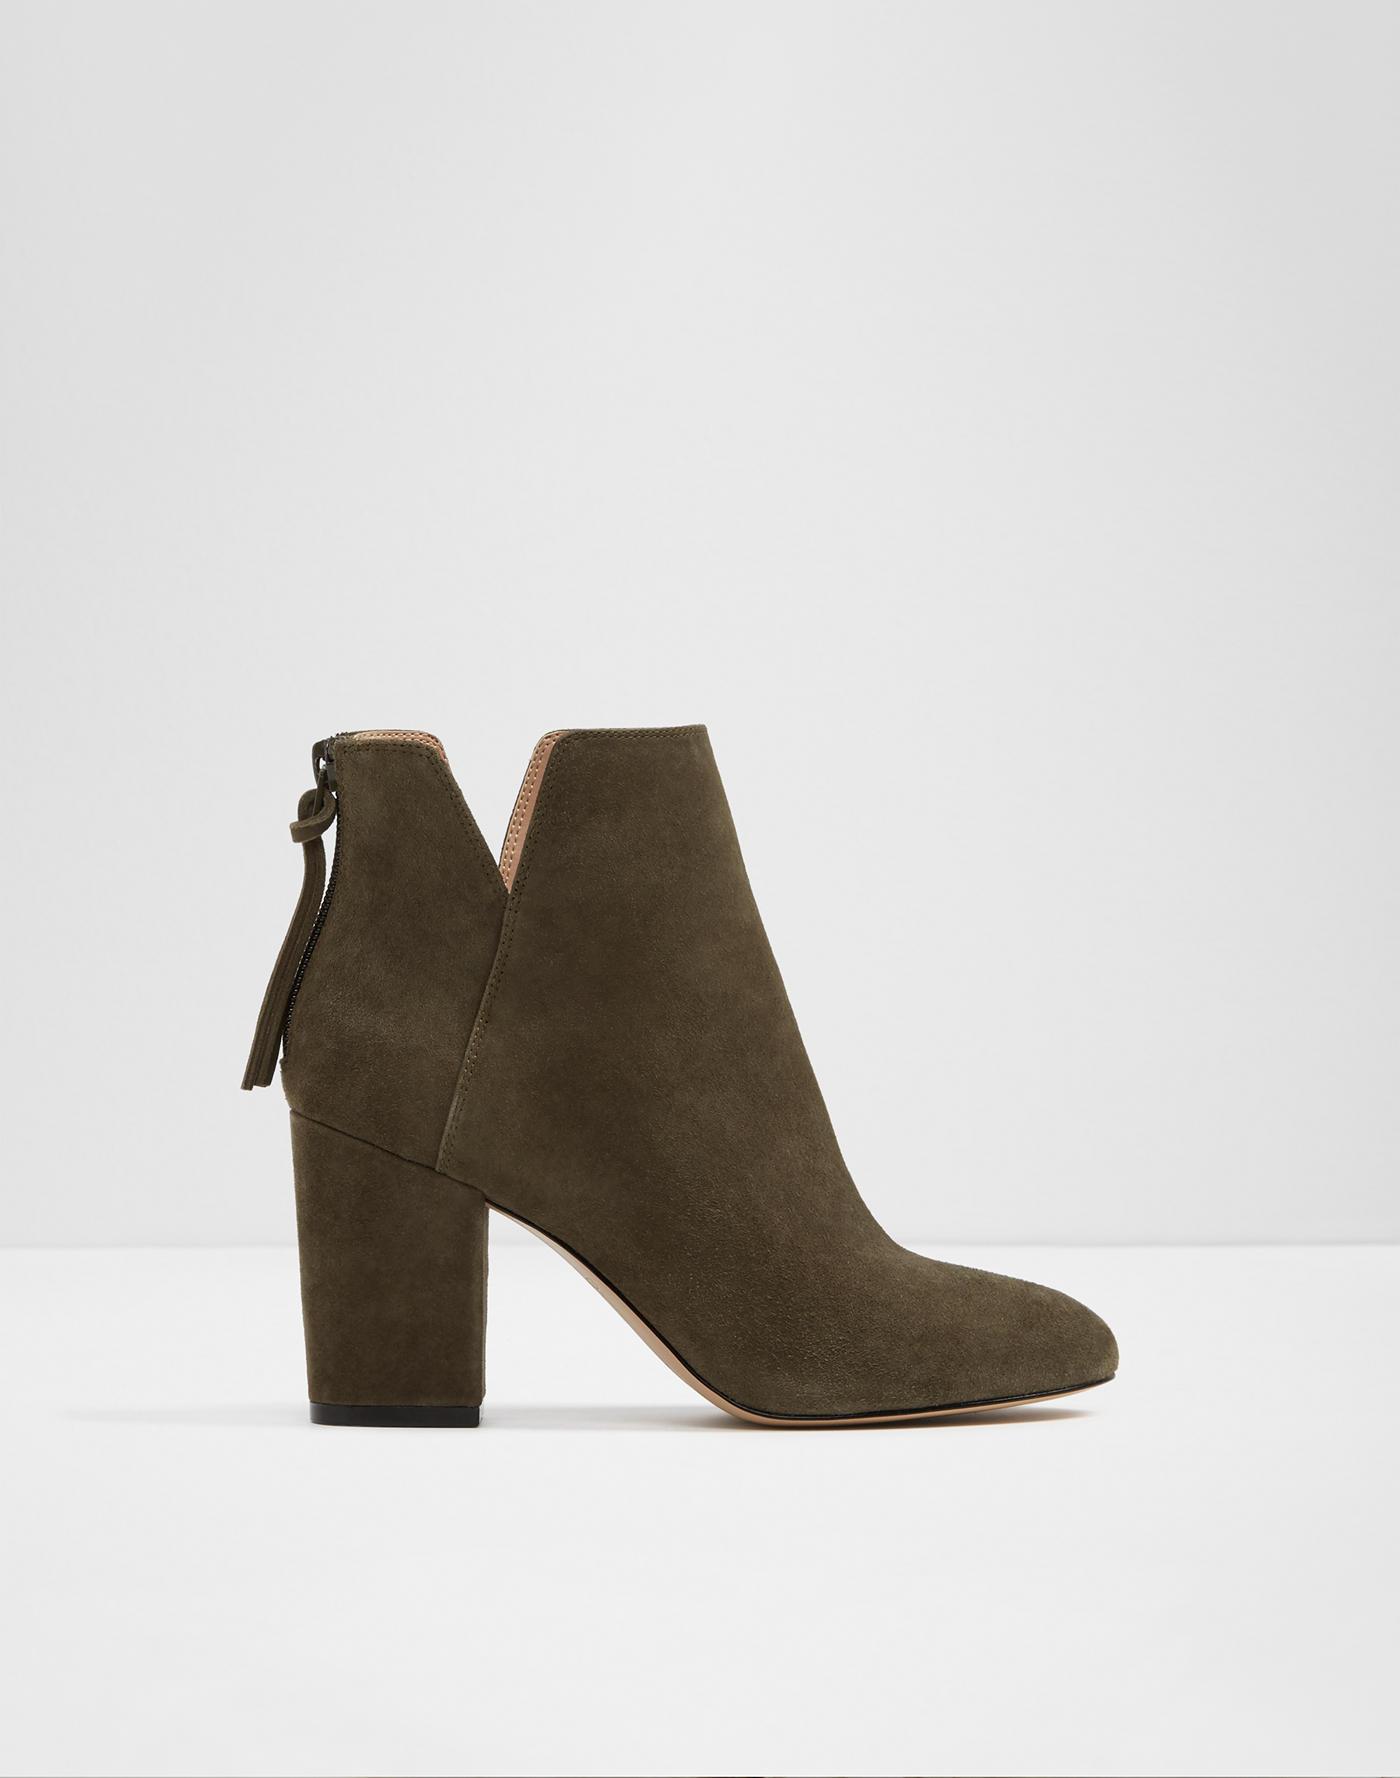 aldo shoes london ontario